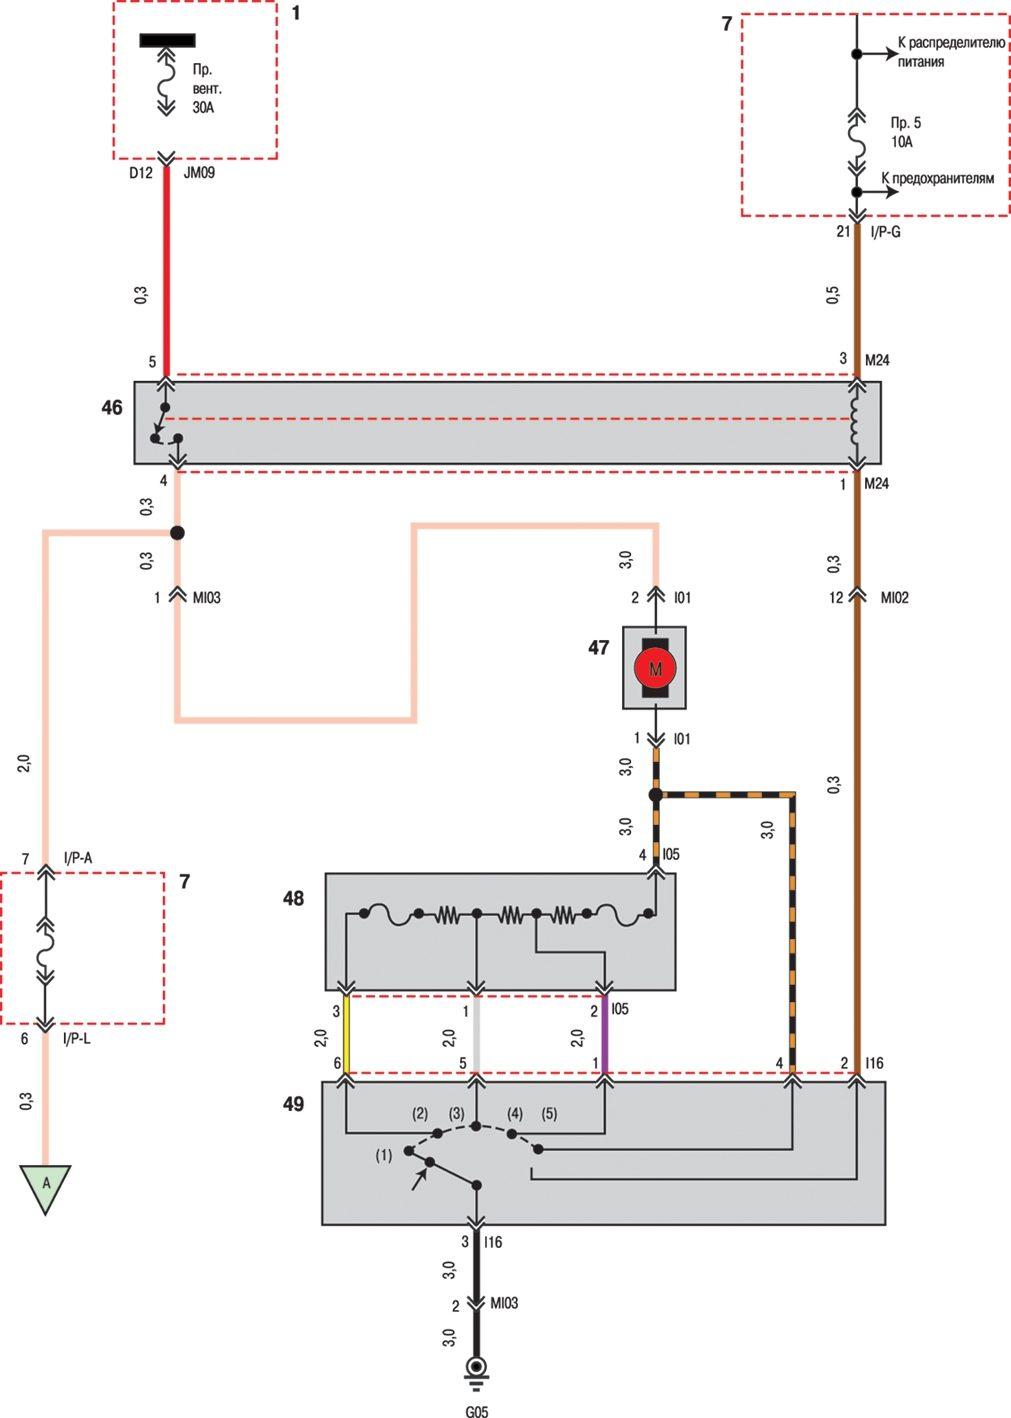 Схема электрооборудования хендай соната фото 972